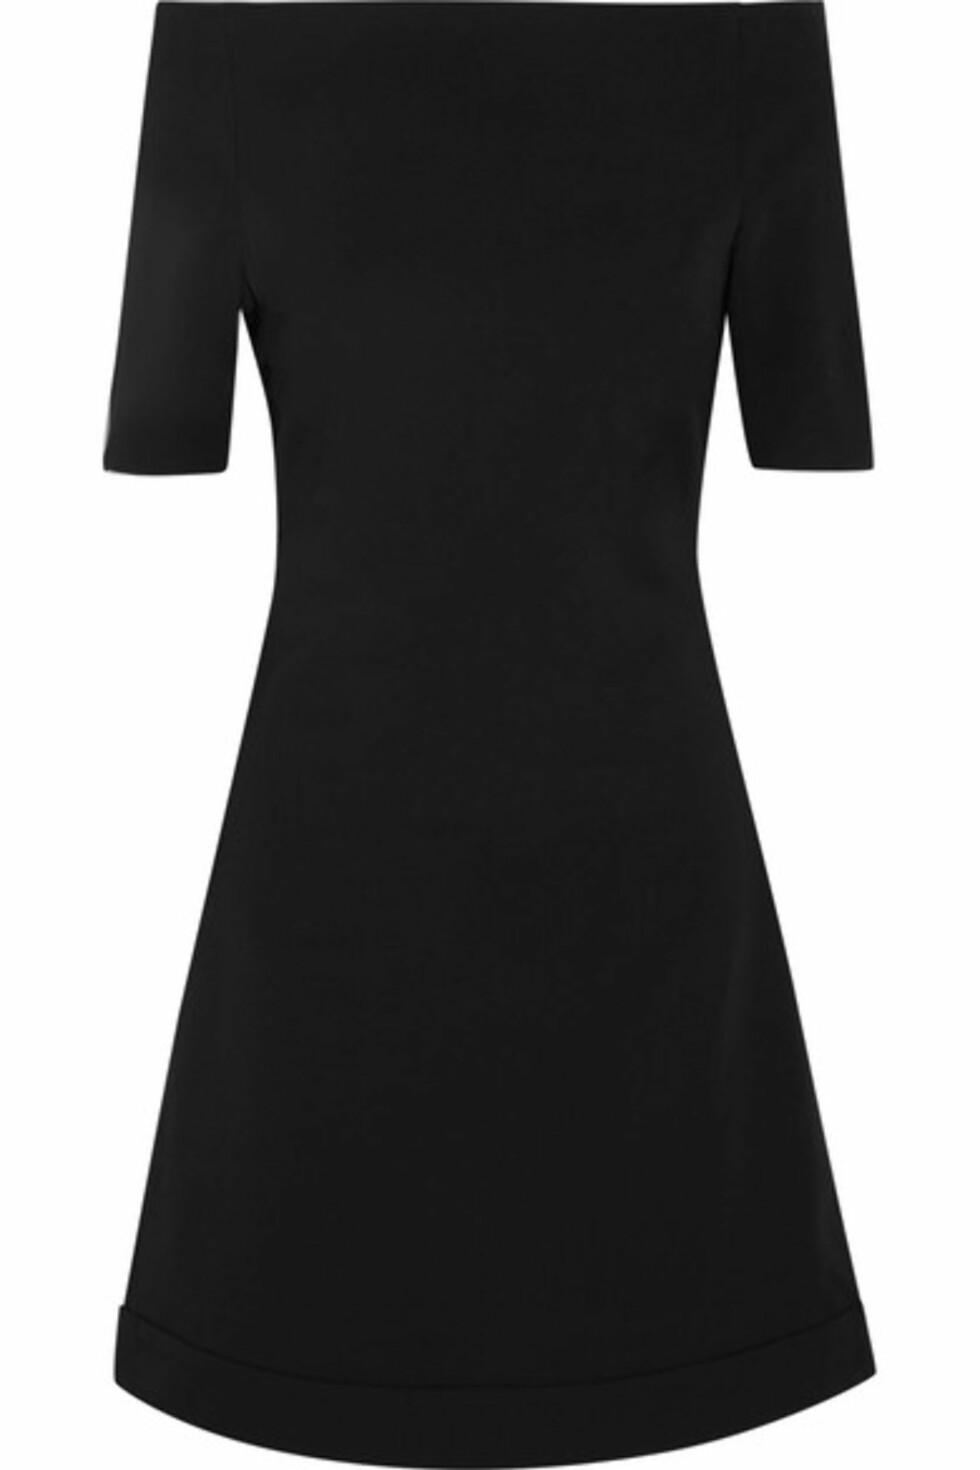 Kjole fra Toteme via Net-a-porter.com | kr 3020 | https://www.net-a-porter.com/no/en/product/756655/toteme/laciana-crepe-mini-dress